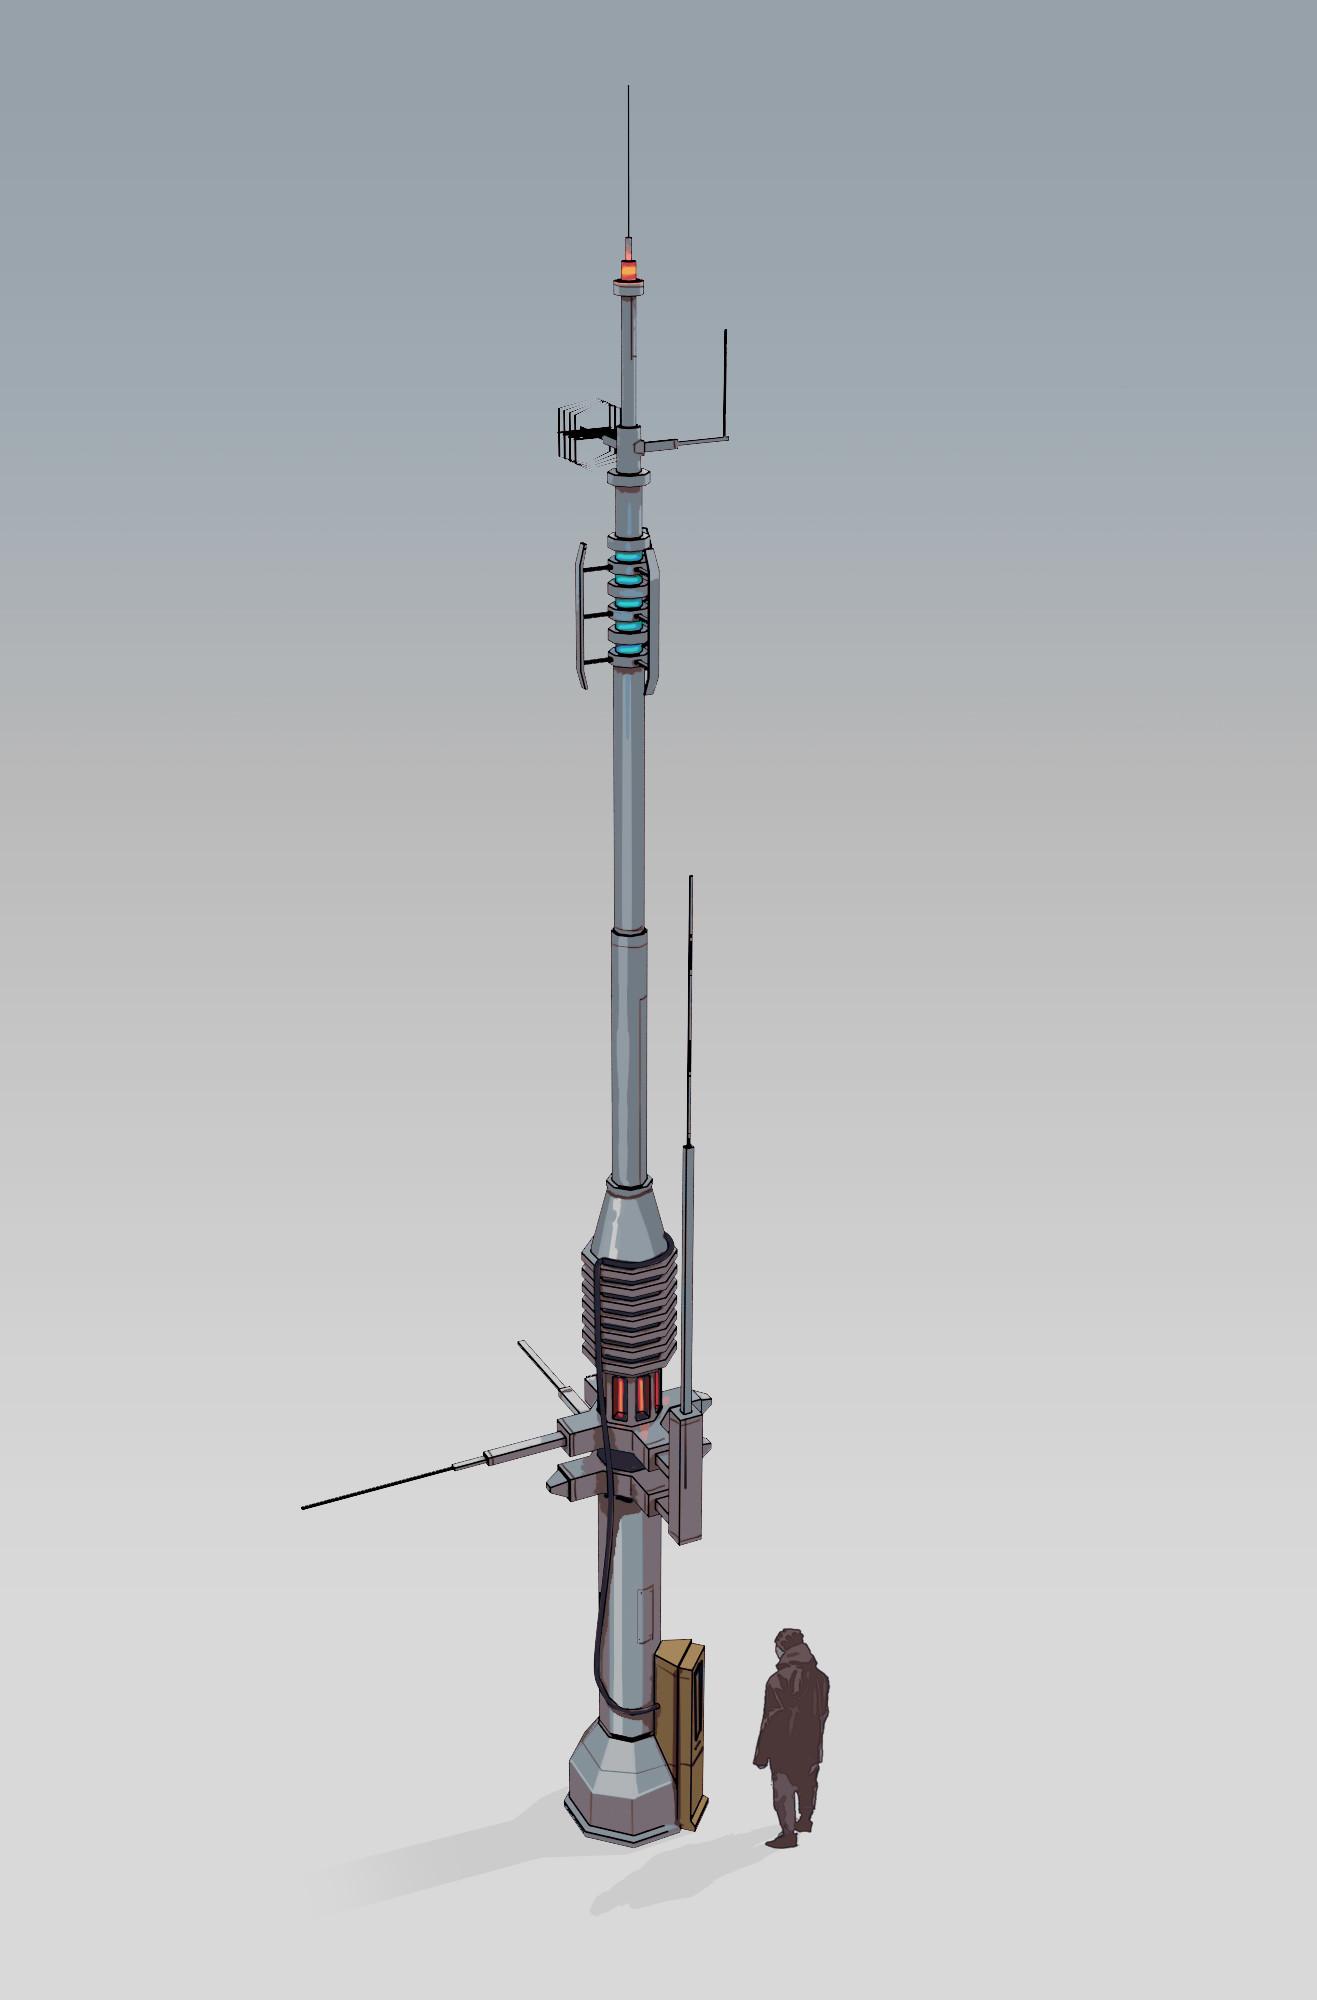 Jeremy paillotin tri 20160116 antenna v002 jp